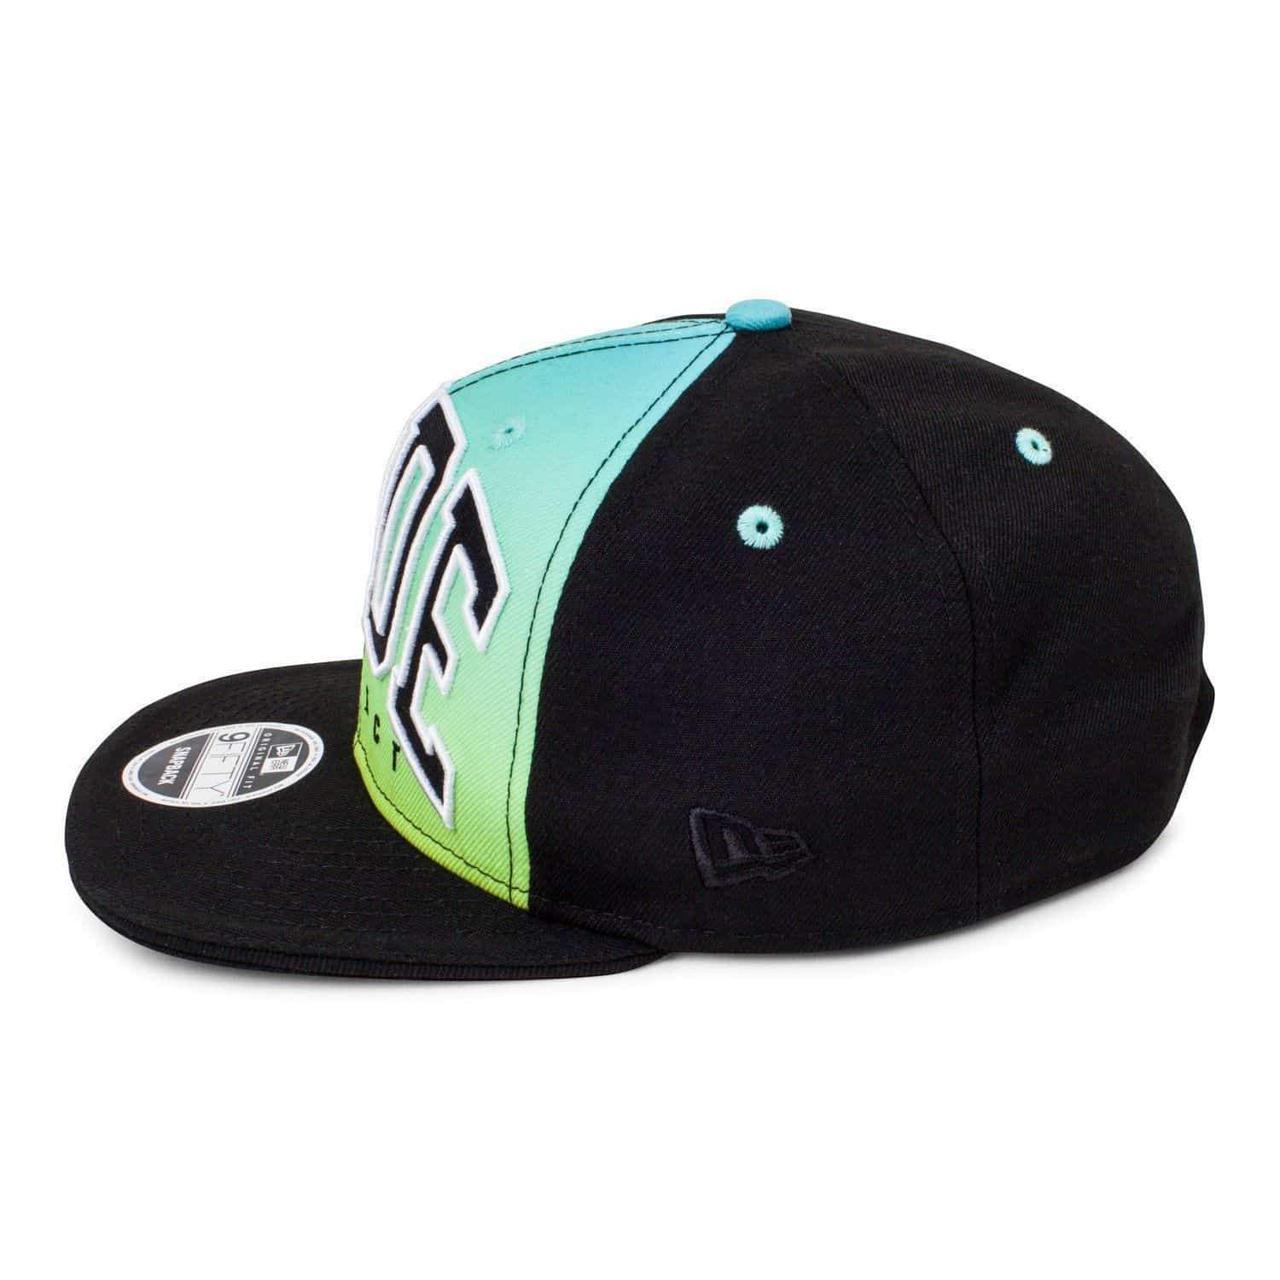 Dude Perfect DP x New Era 9Fifty Snapback    Green + Mint ff2bcc7a978